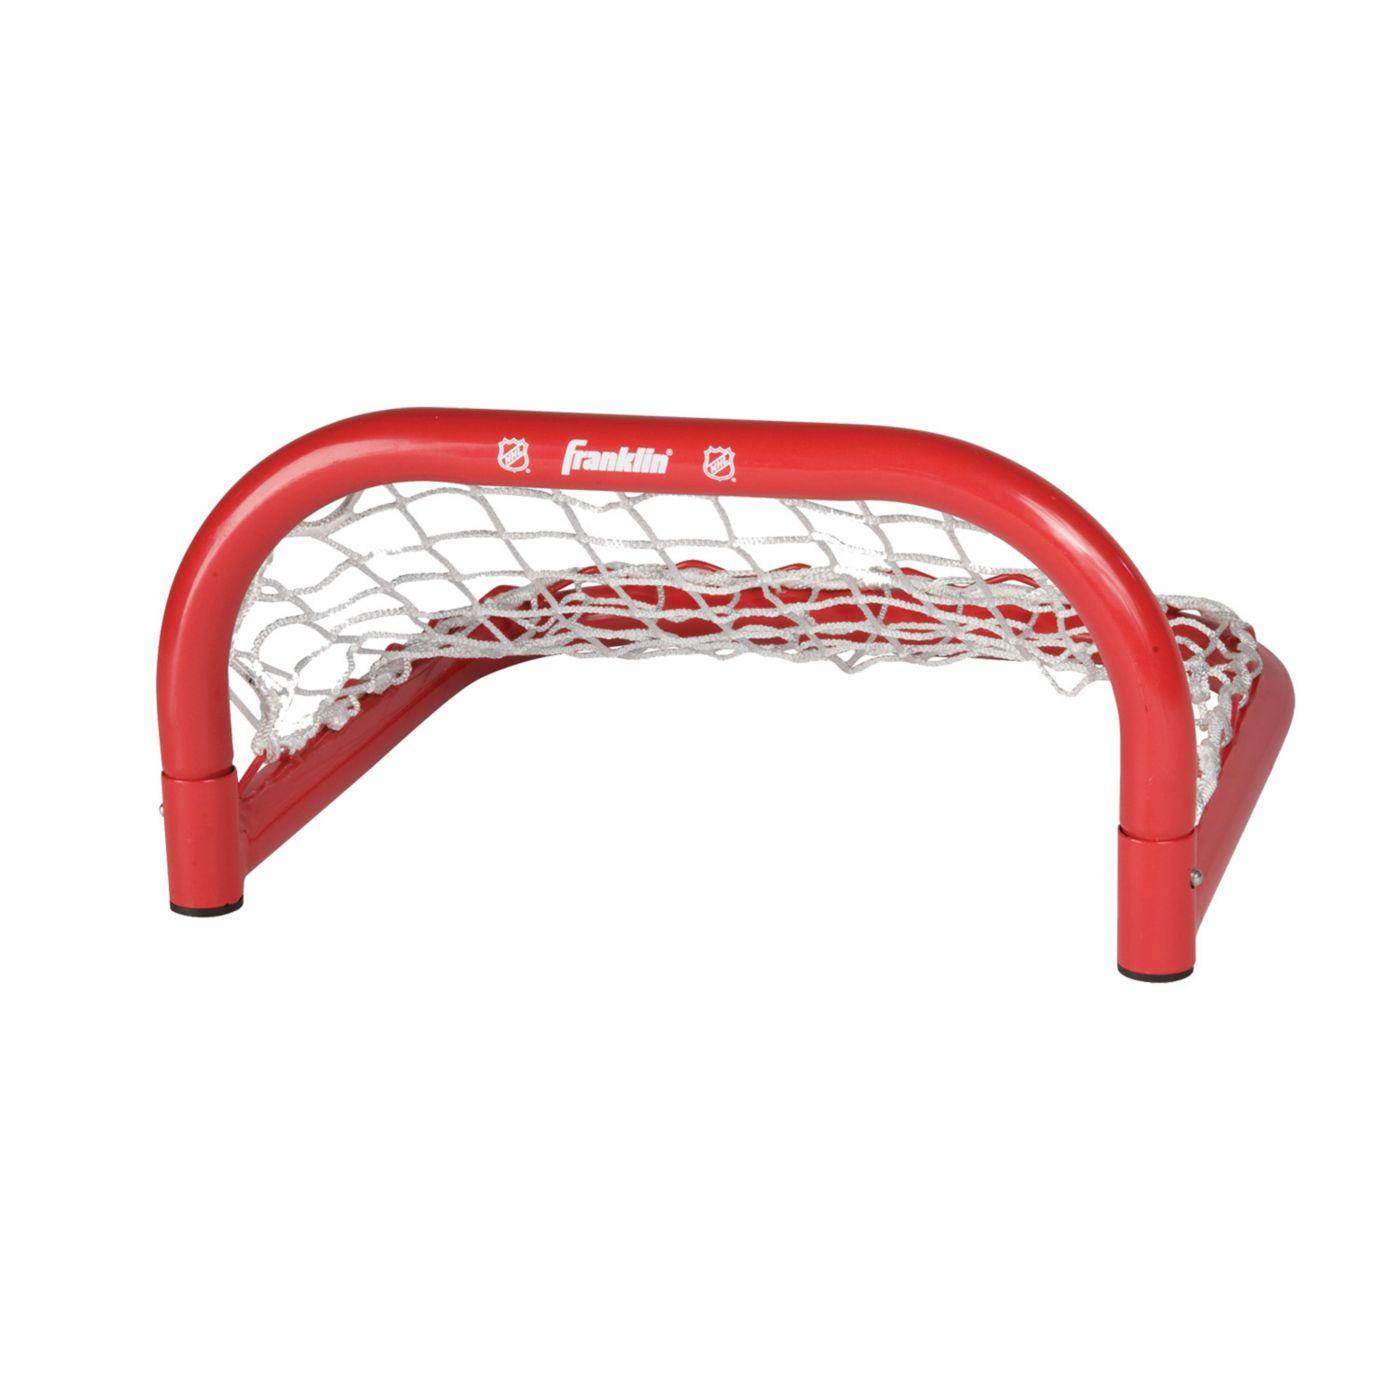 Franklin NHL Mini Skill Hockey Goal